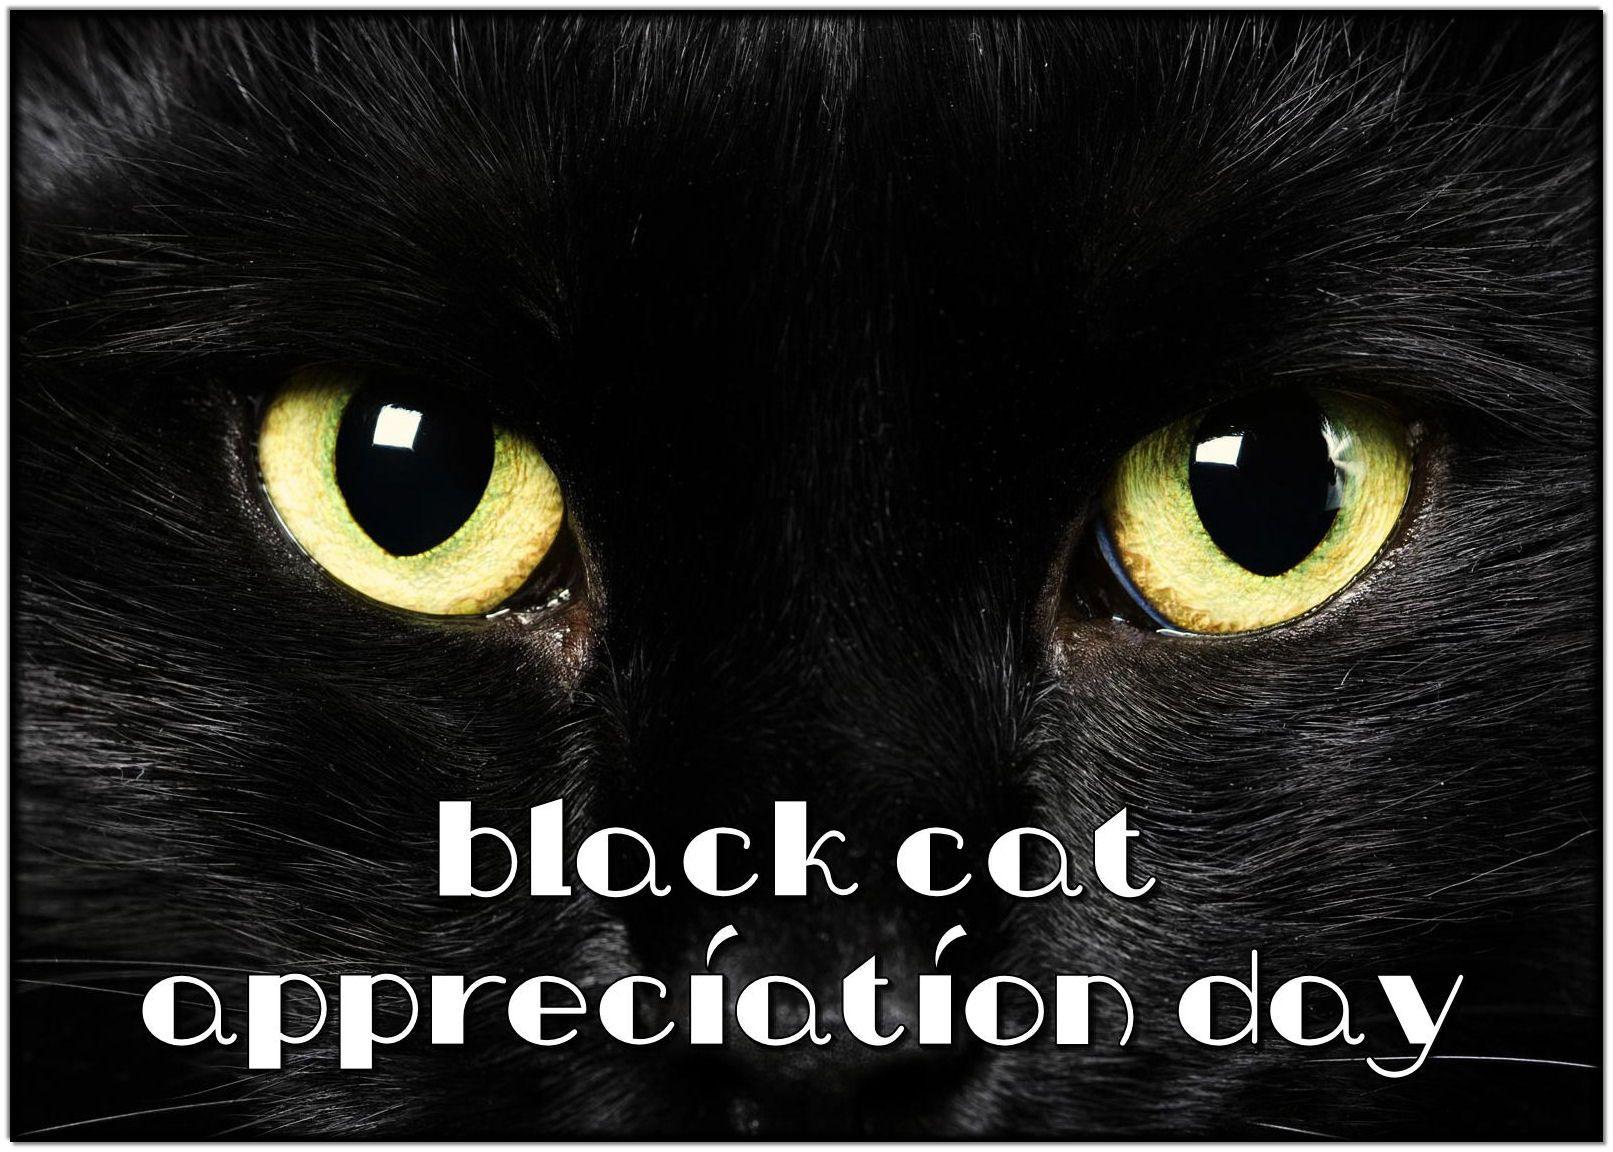 October 27 Is Black Cat Appreciation Day Black Cat Appreciation Day Cats National Holidays